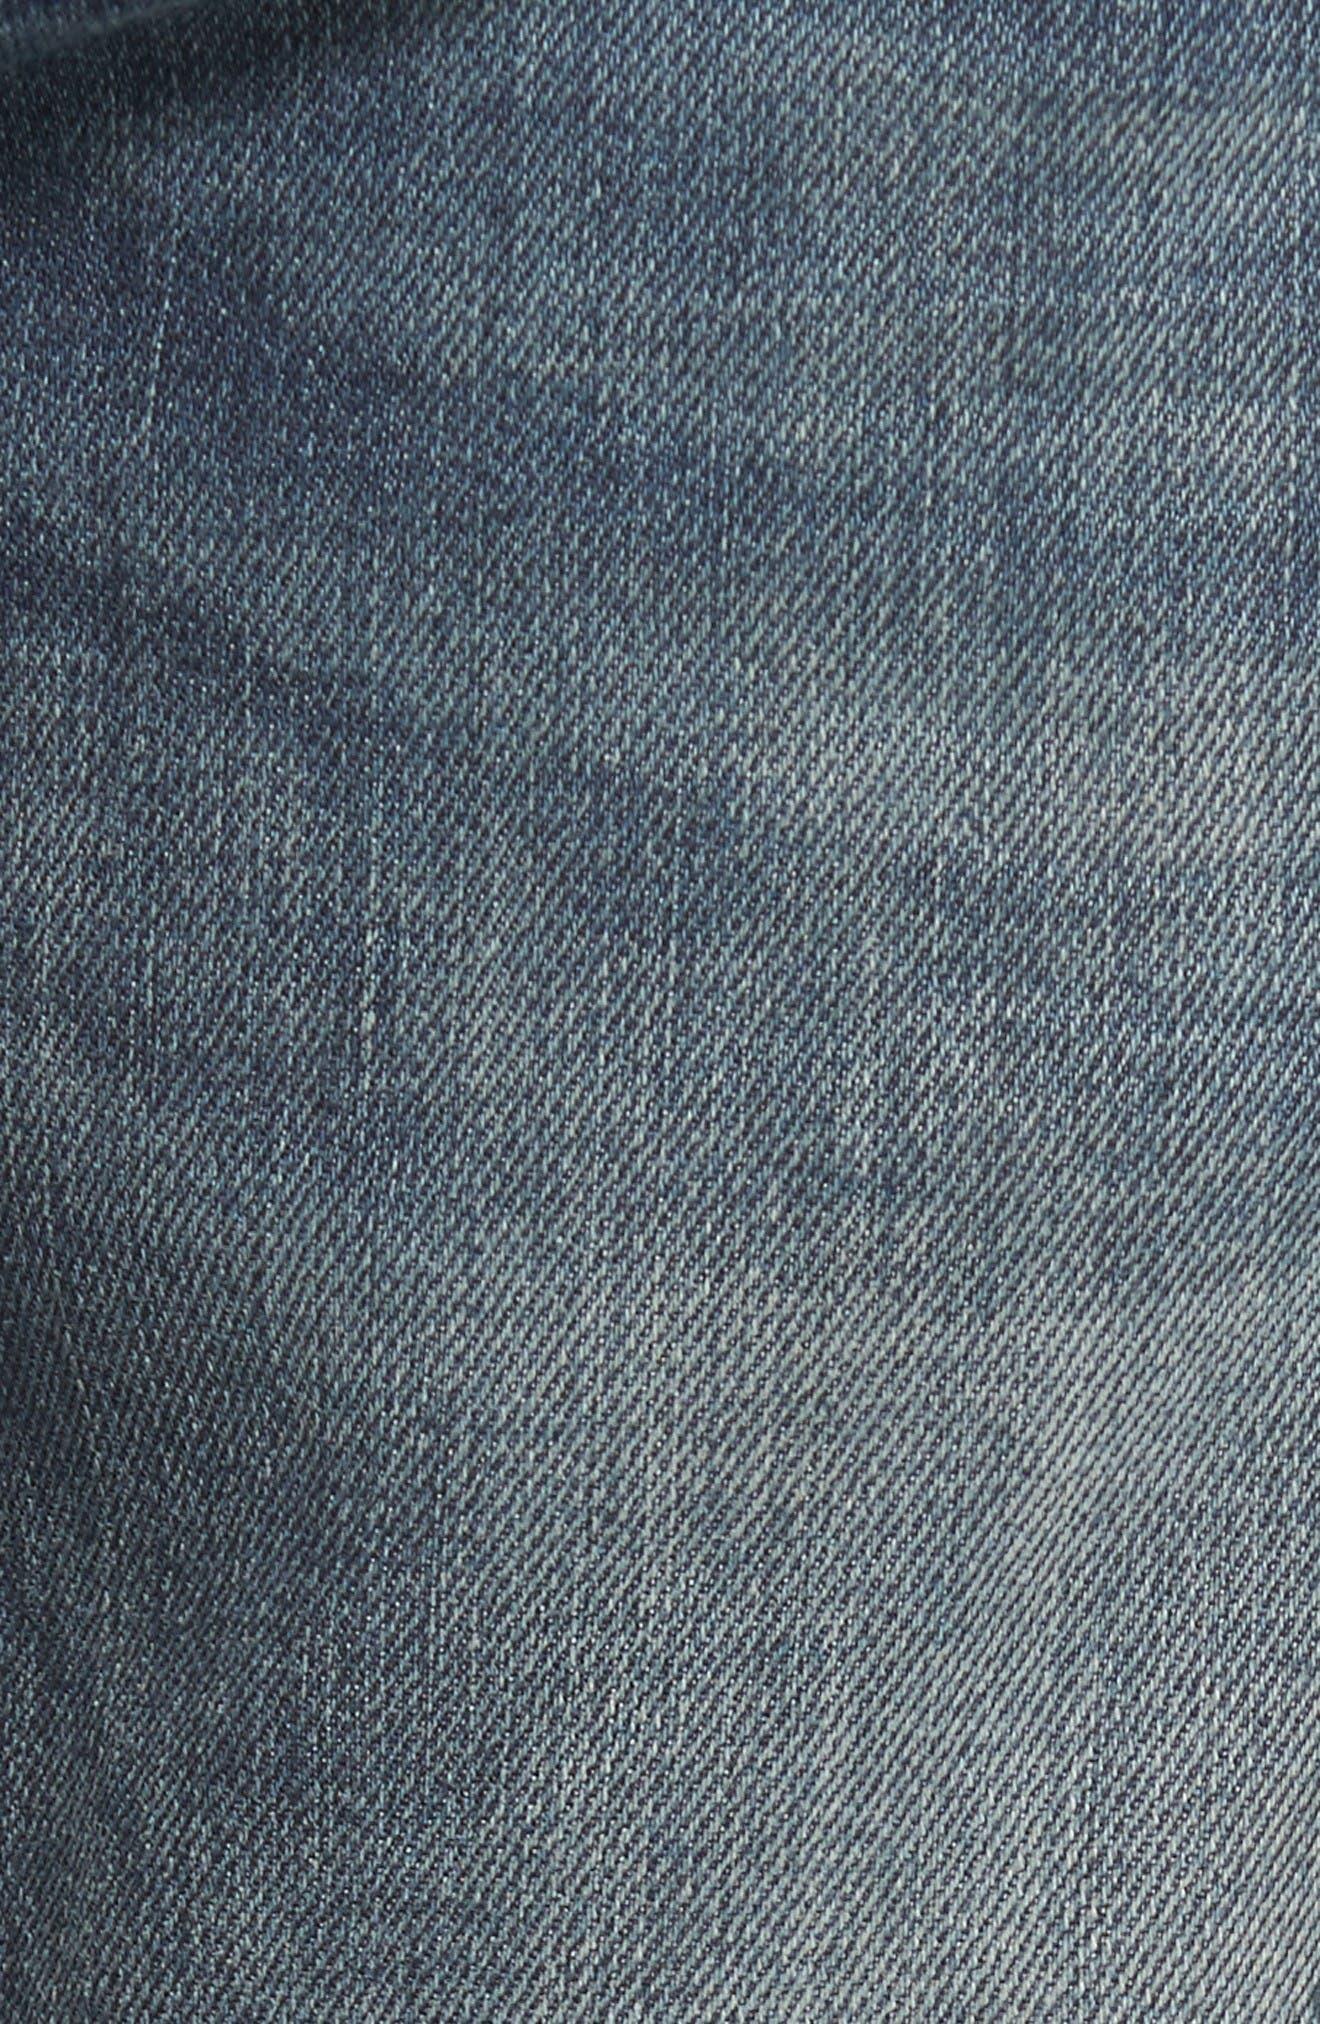 Safado Slim Straight Fit Jeans,                             Alternate thumbnail 5, color,                             860K